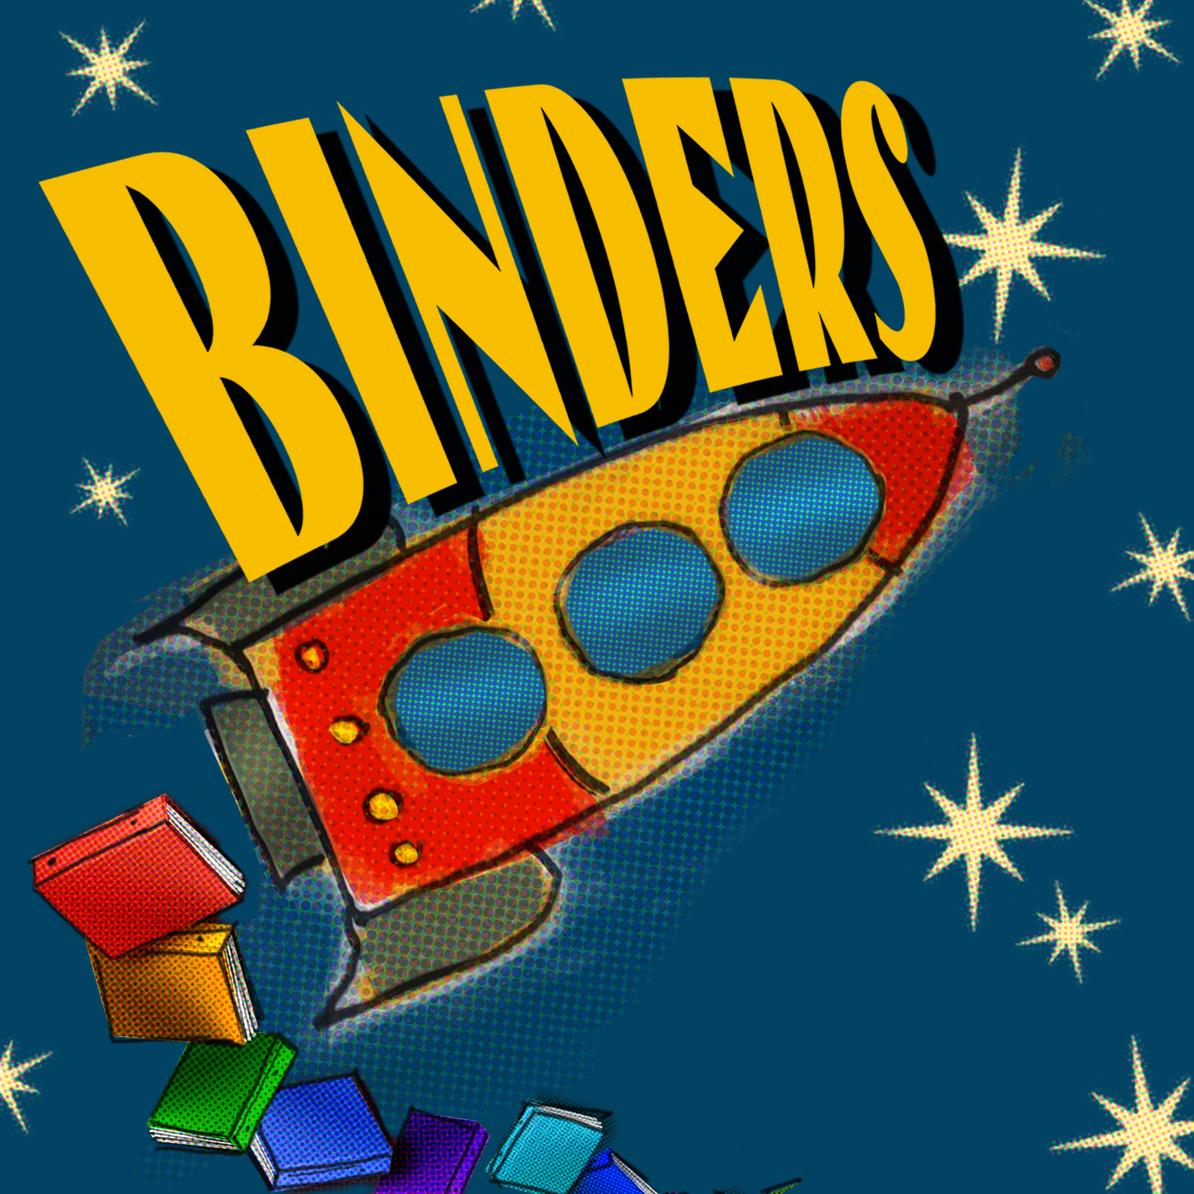 binders square 21